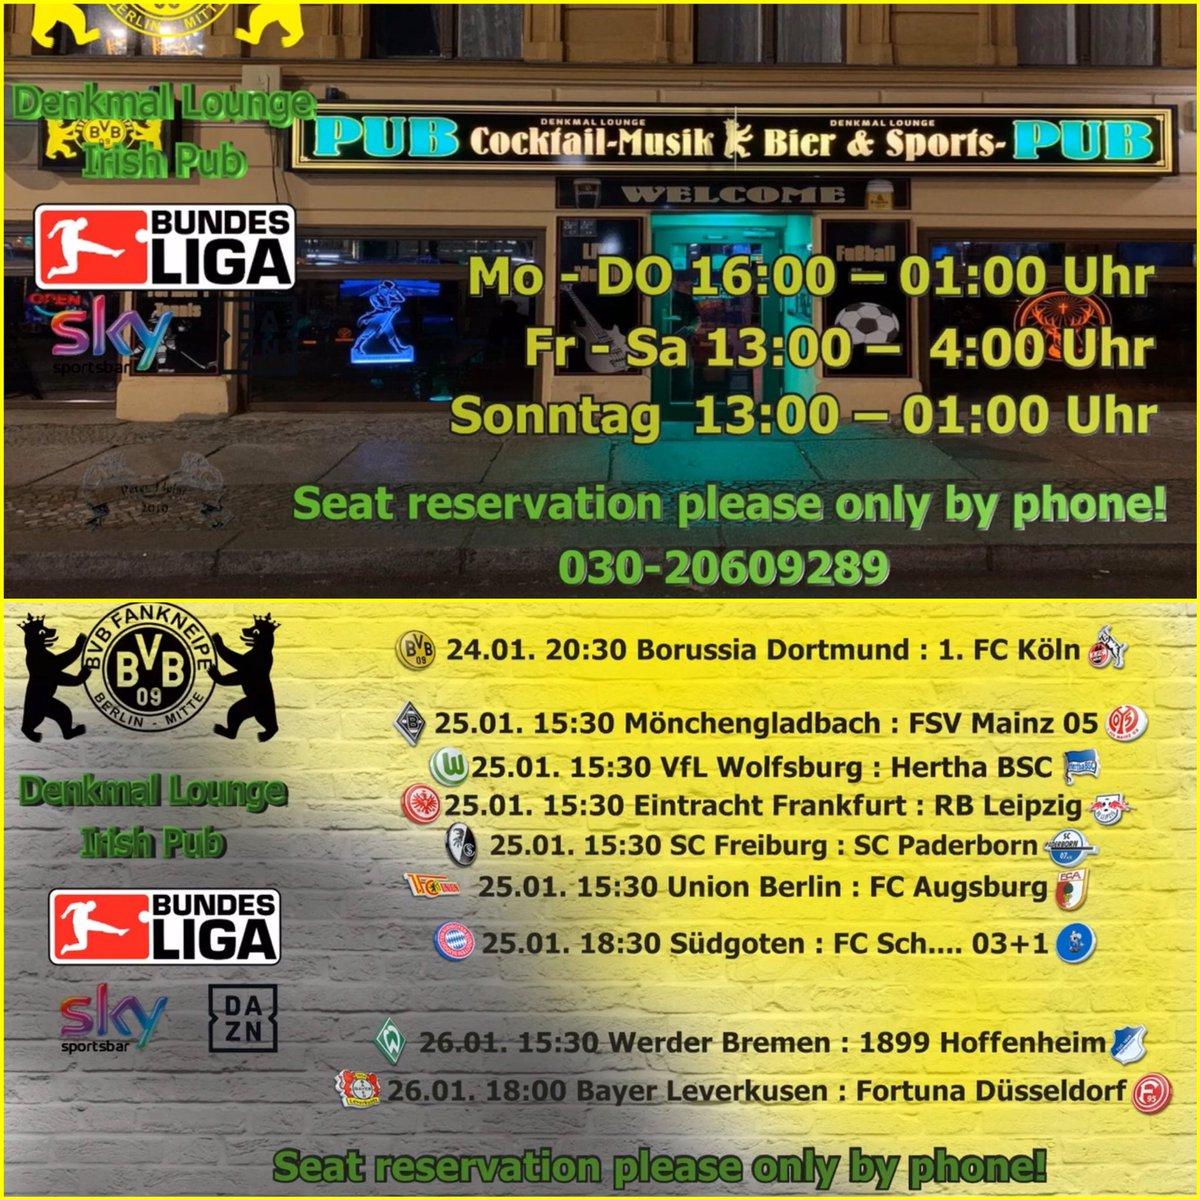 Ab 13.00 Uhr geöffnet 🤣👍🍺🍺#Premier_League #Bundesliga #Pub #SkySports #Sky